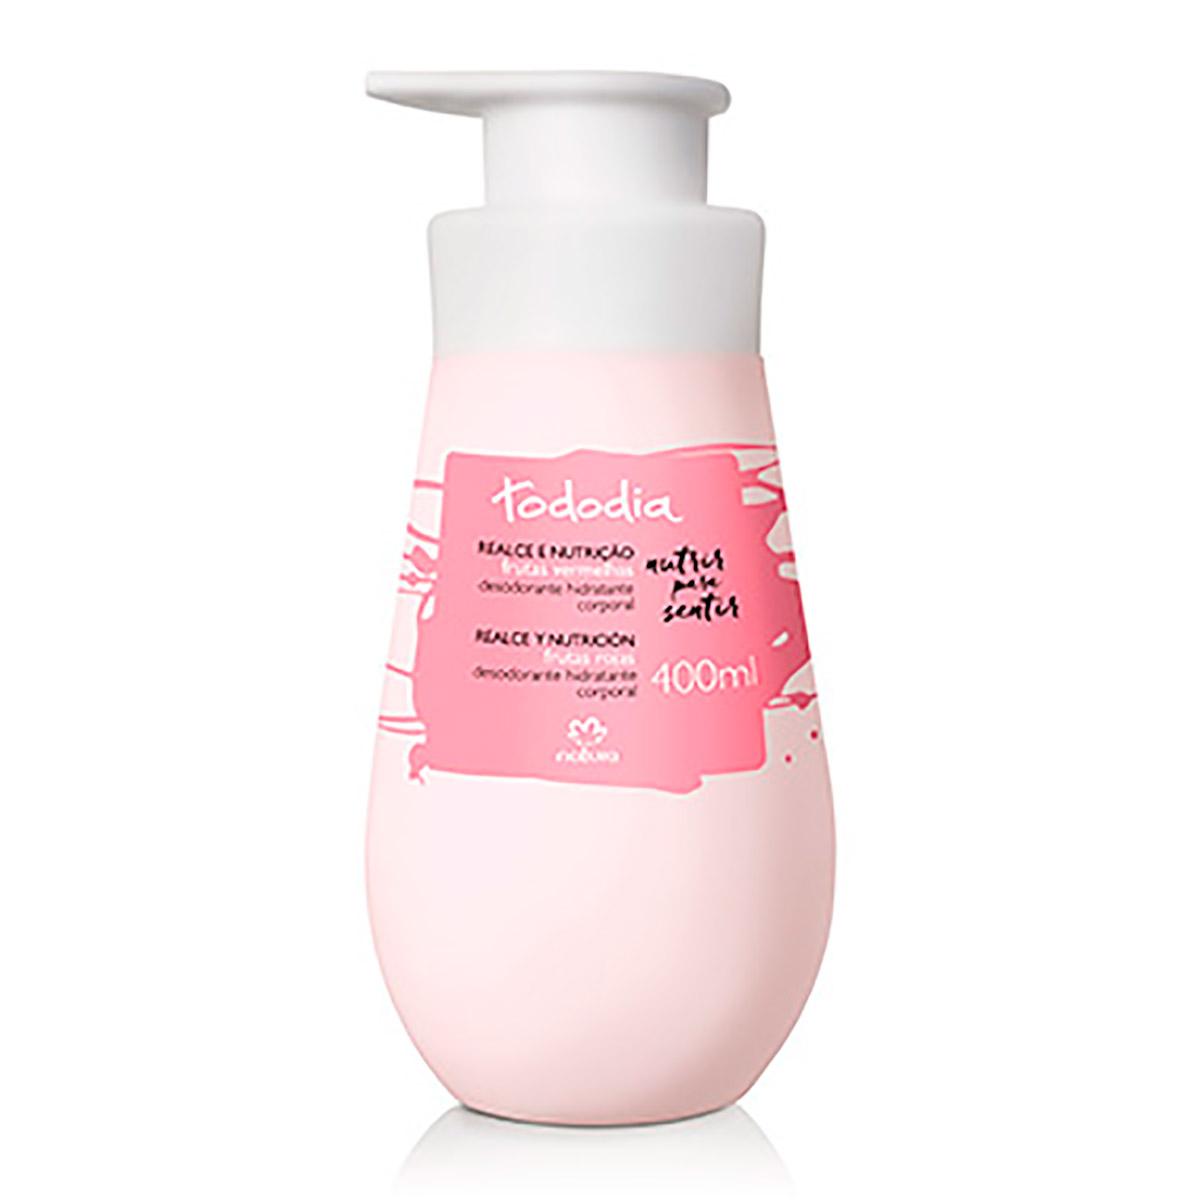 Desodorante Hidratante Corporal Frutas Vermelhas Tododia - 400ml - 63946